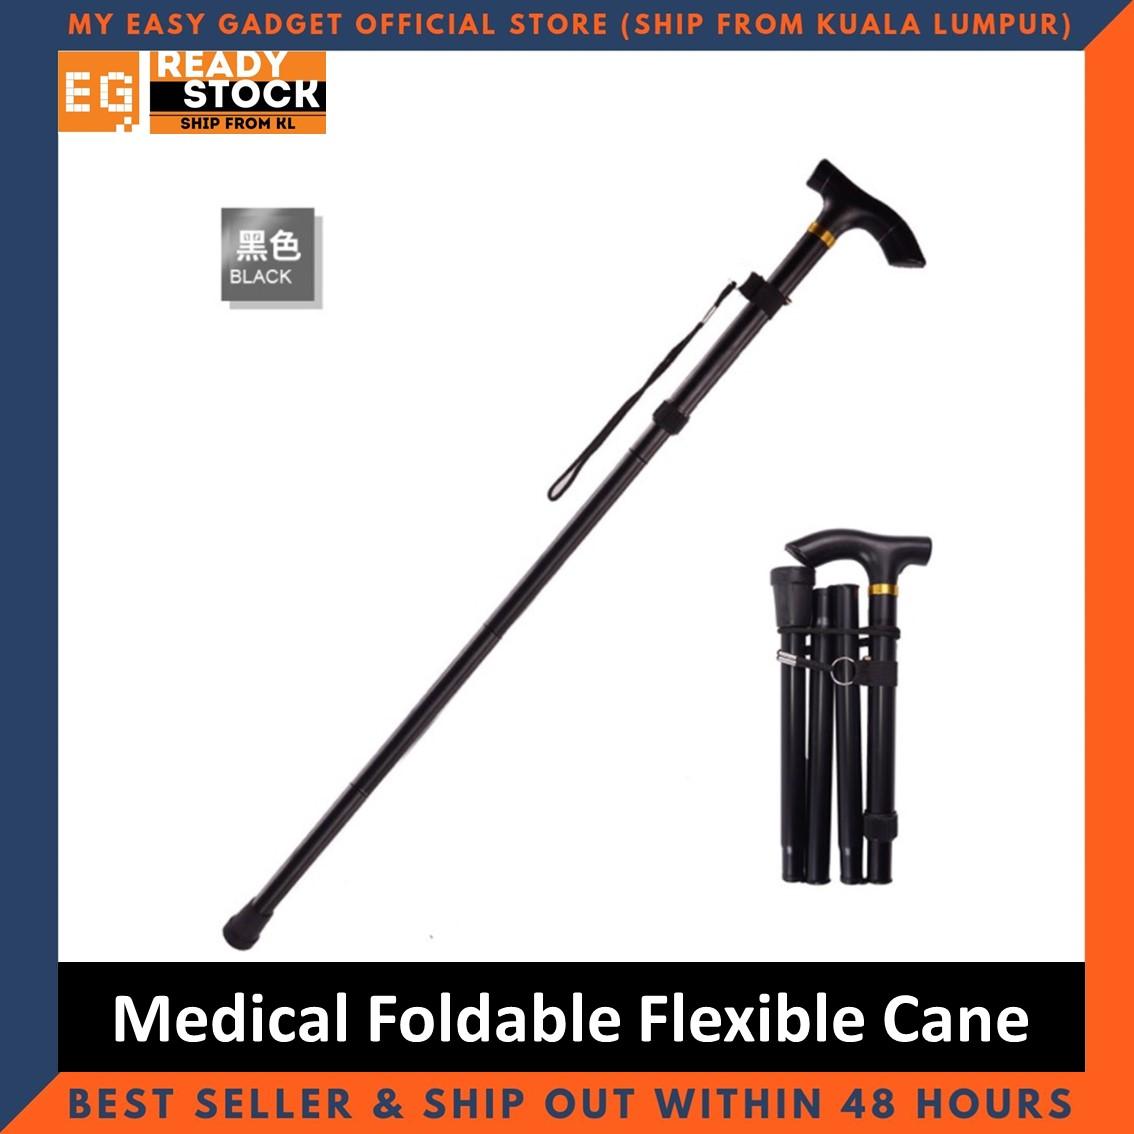 Medical Foldable Flexible Cane Walker Crutch Aid Mobility / Tongkat for Senior Care / Mountain Tongkat